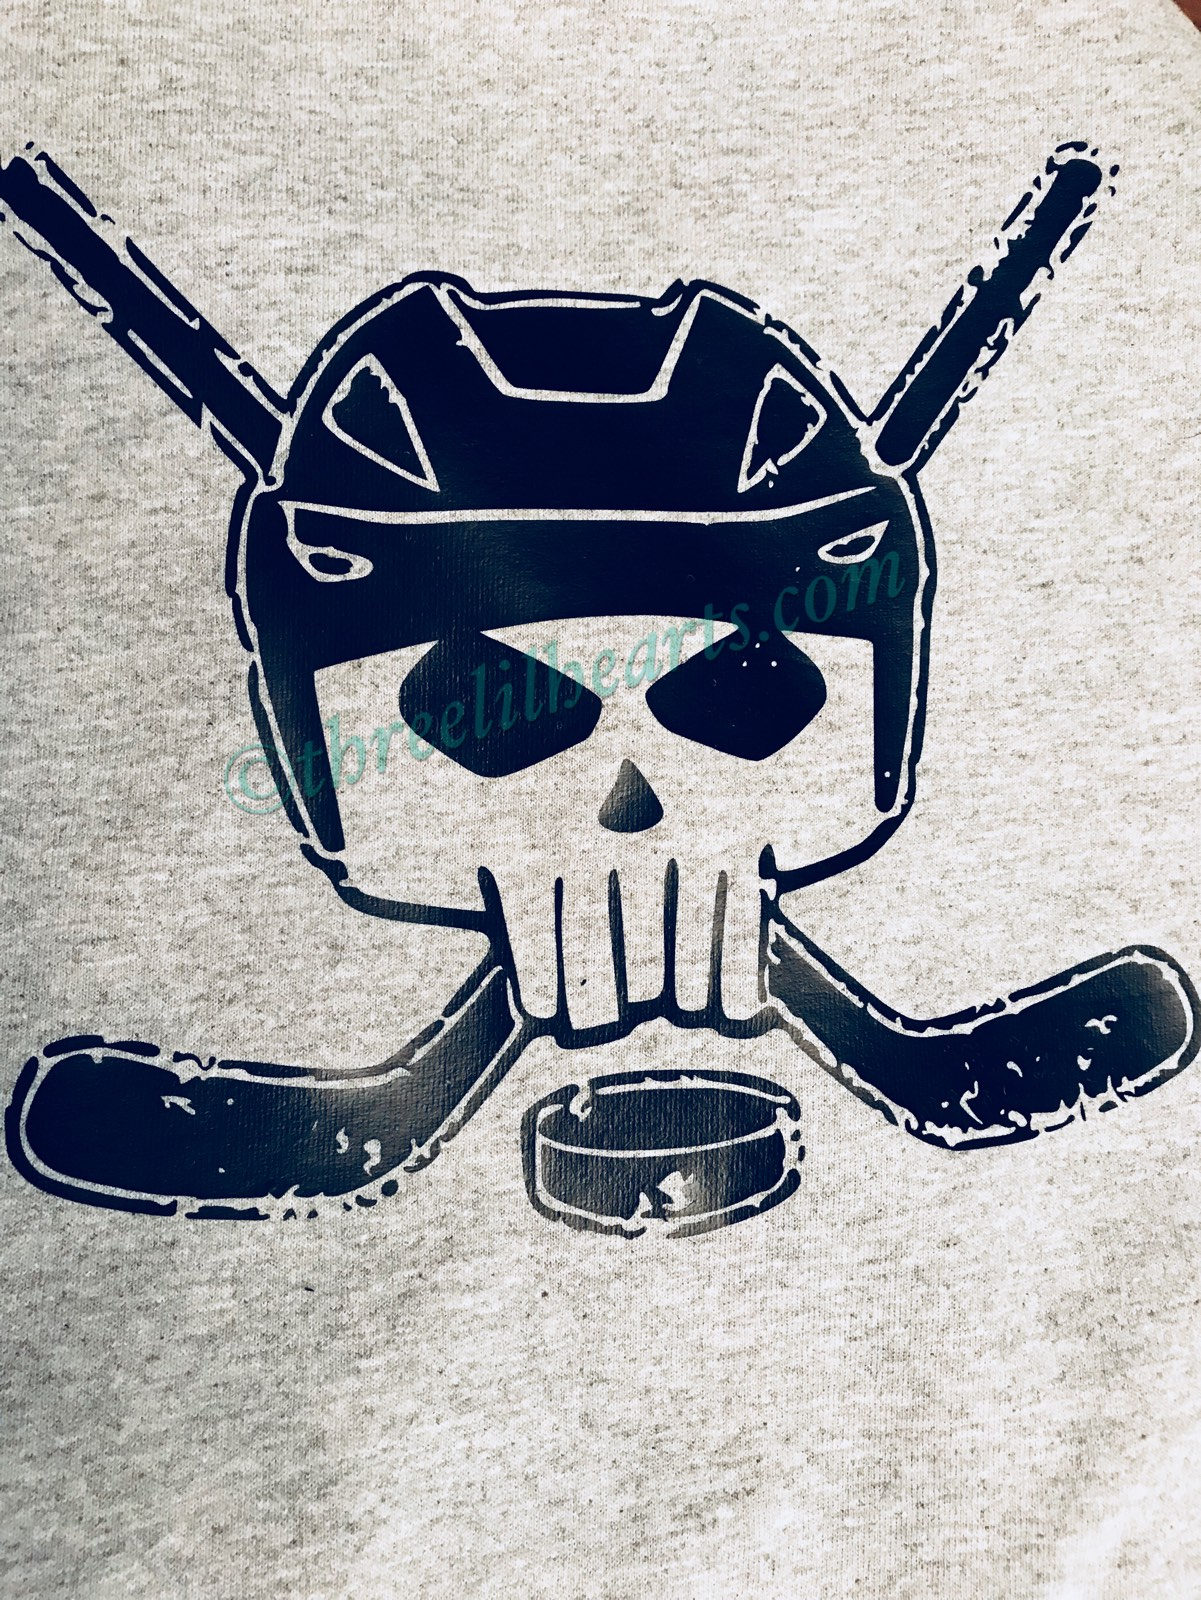 1201x1600 Hockey Punisher Skull Cross Sticks Perfect For Halloween T Shirt